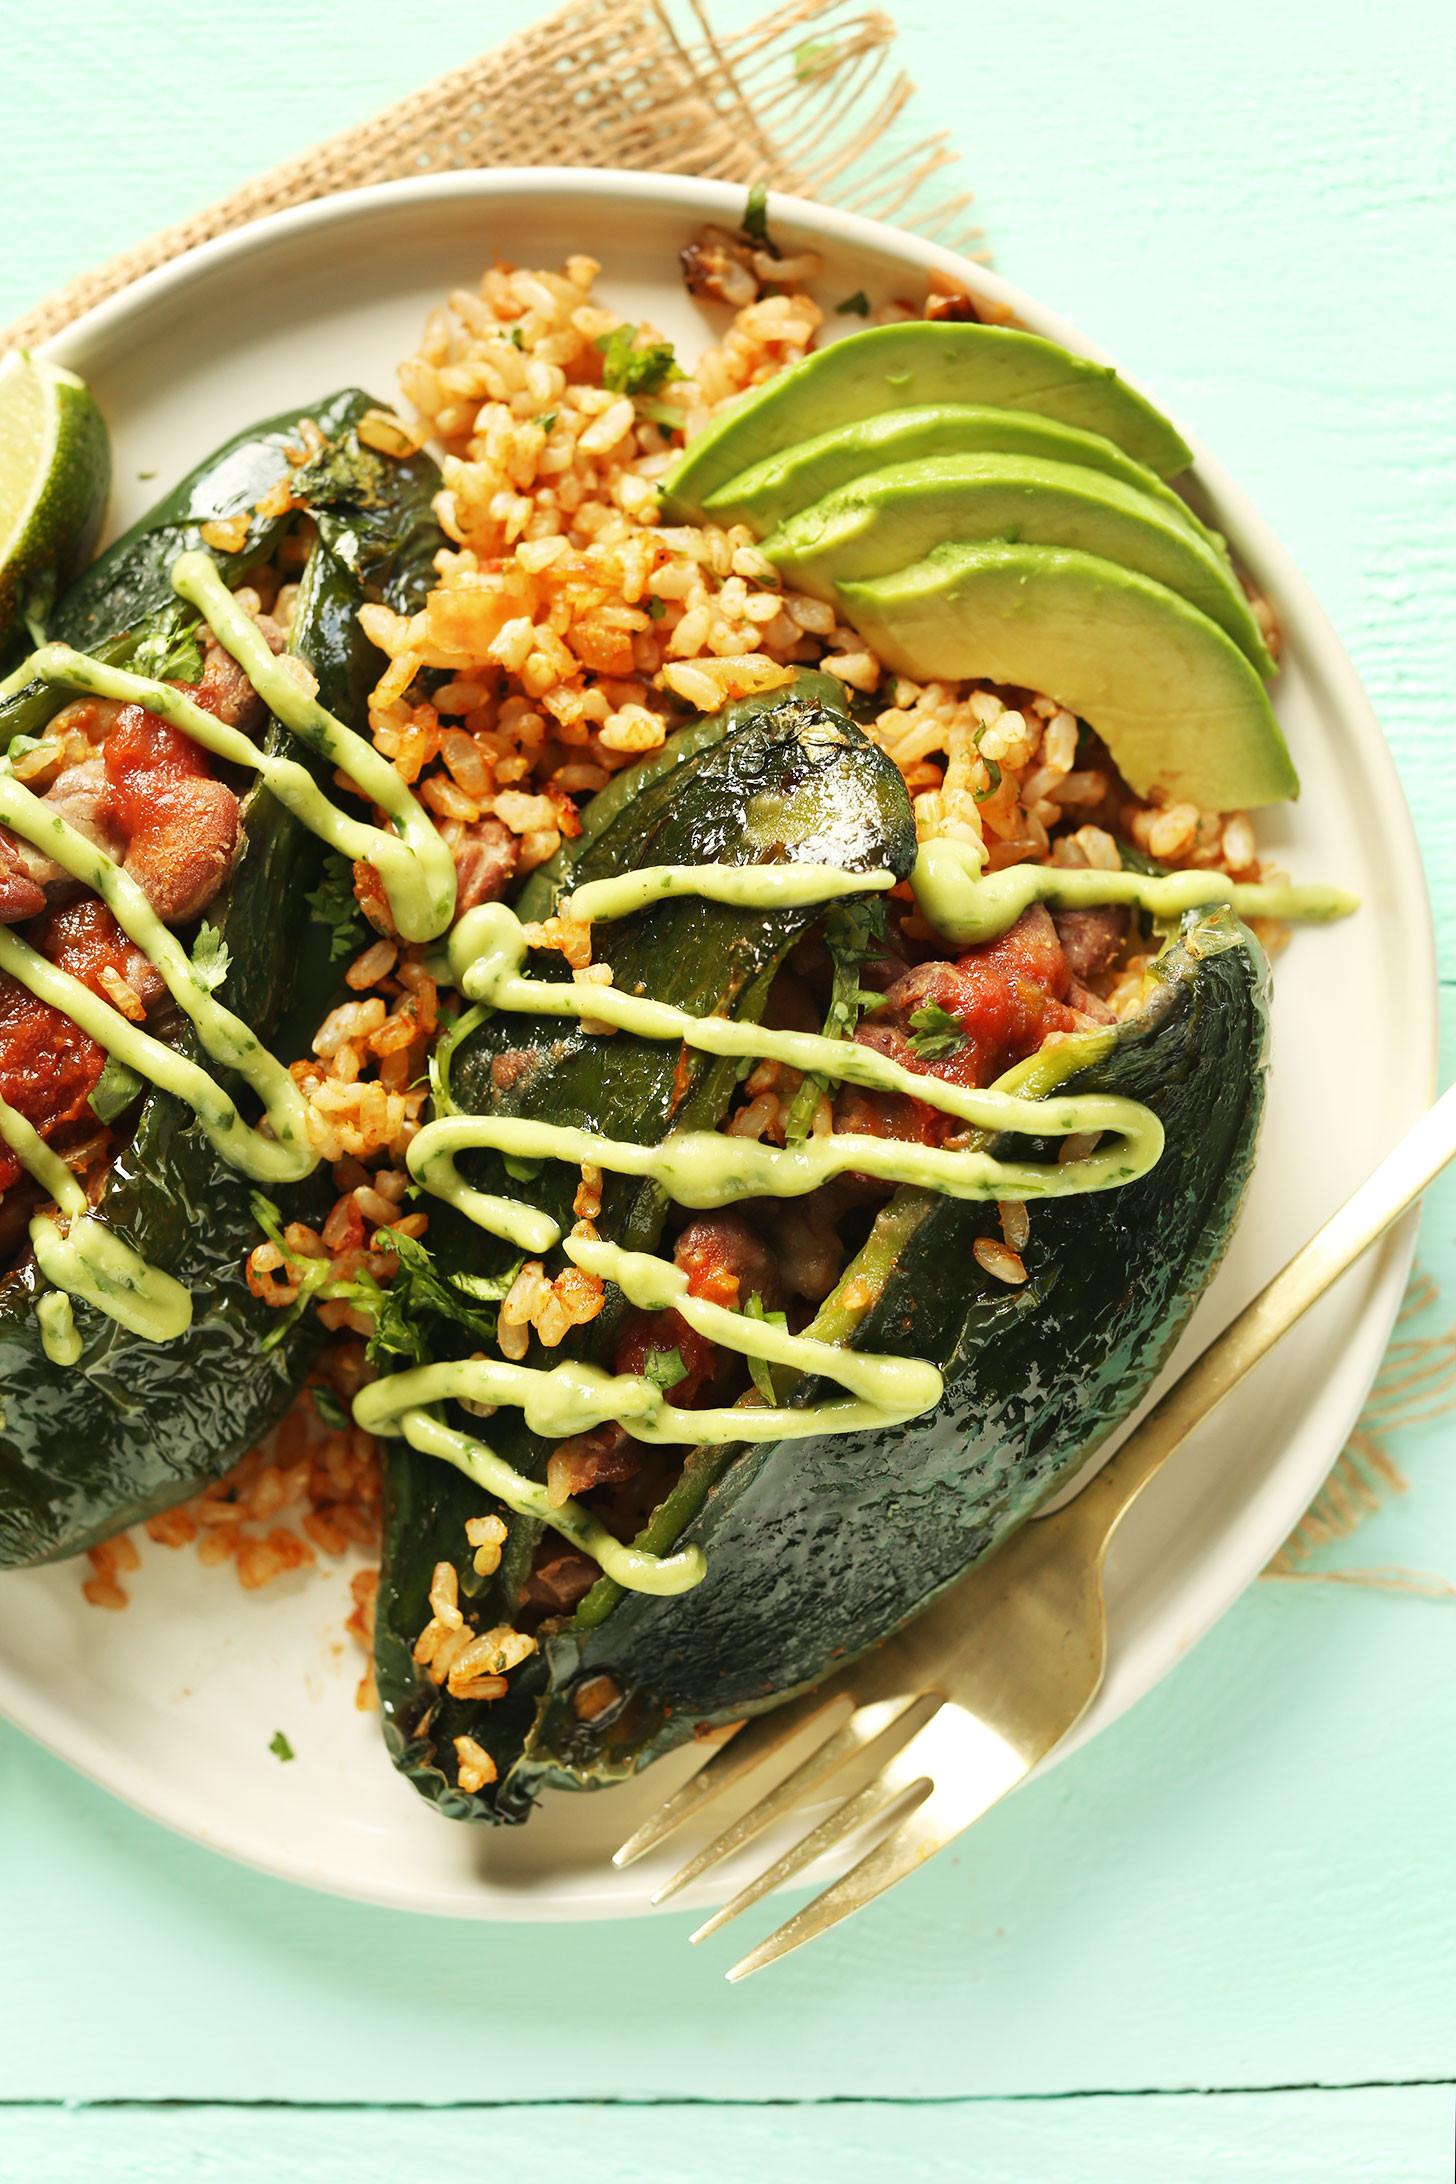 Vegan Plant Based Recipes  Vegan Stuffed Poblano Peppers